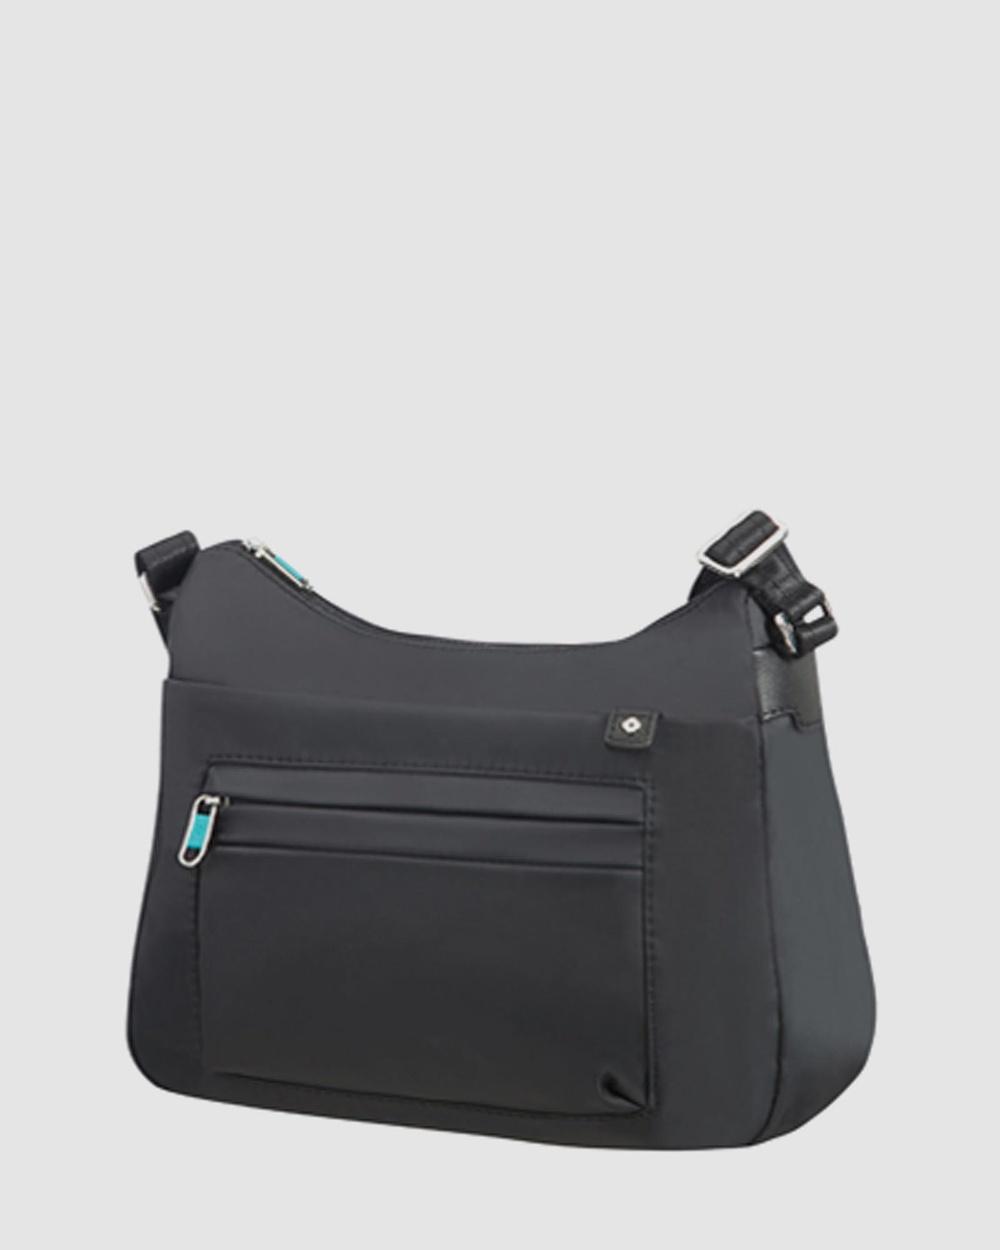 Samsonite Move 2.0 Secure Medium Shoulder Bag Handbags Black Handbags Australia